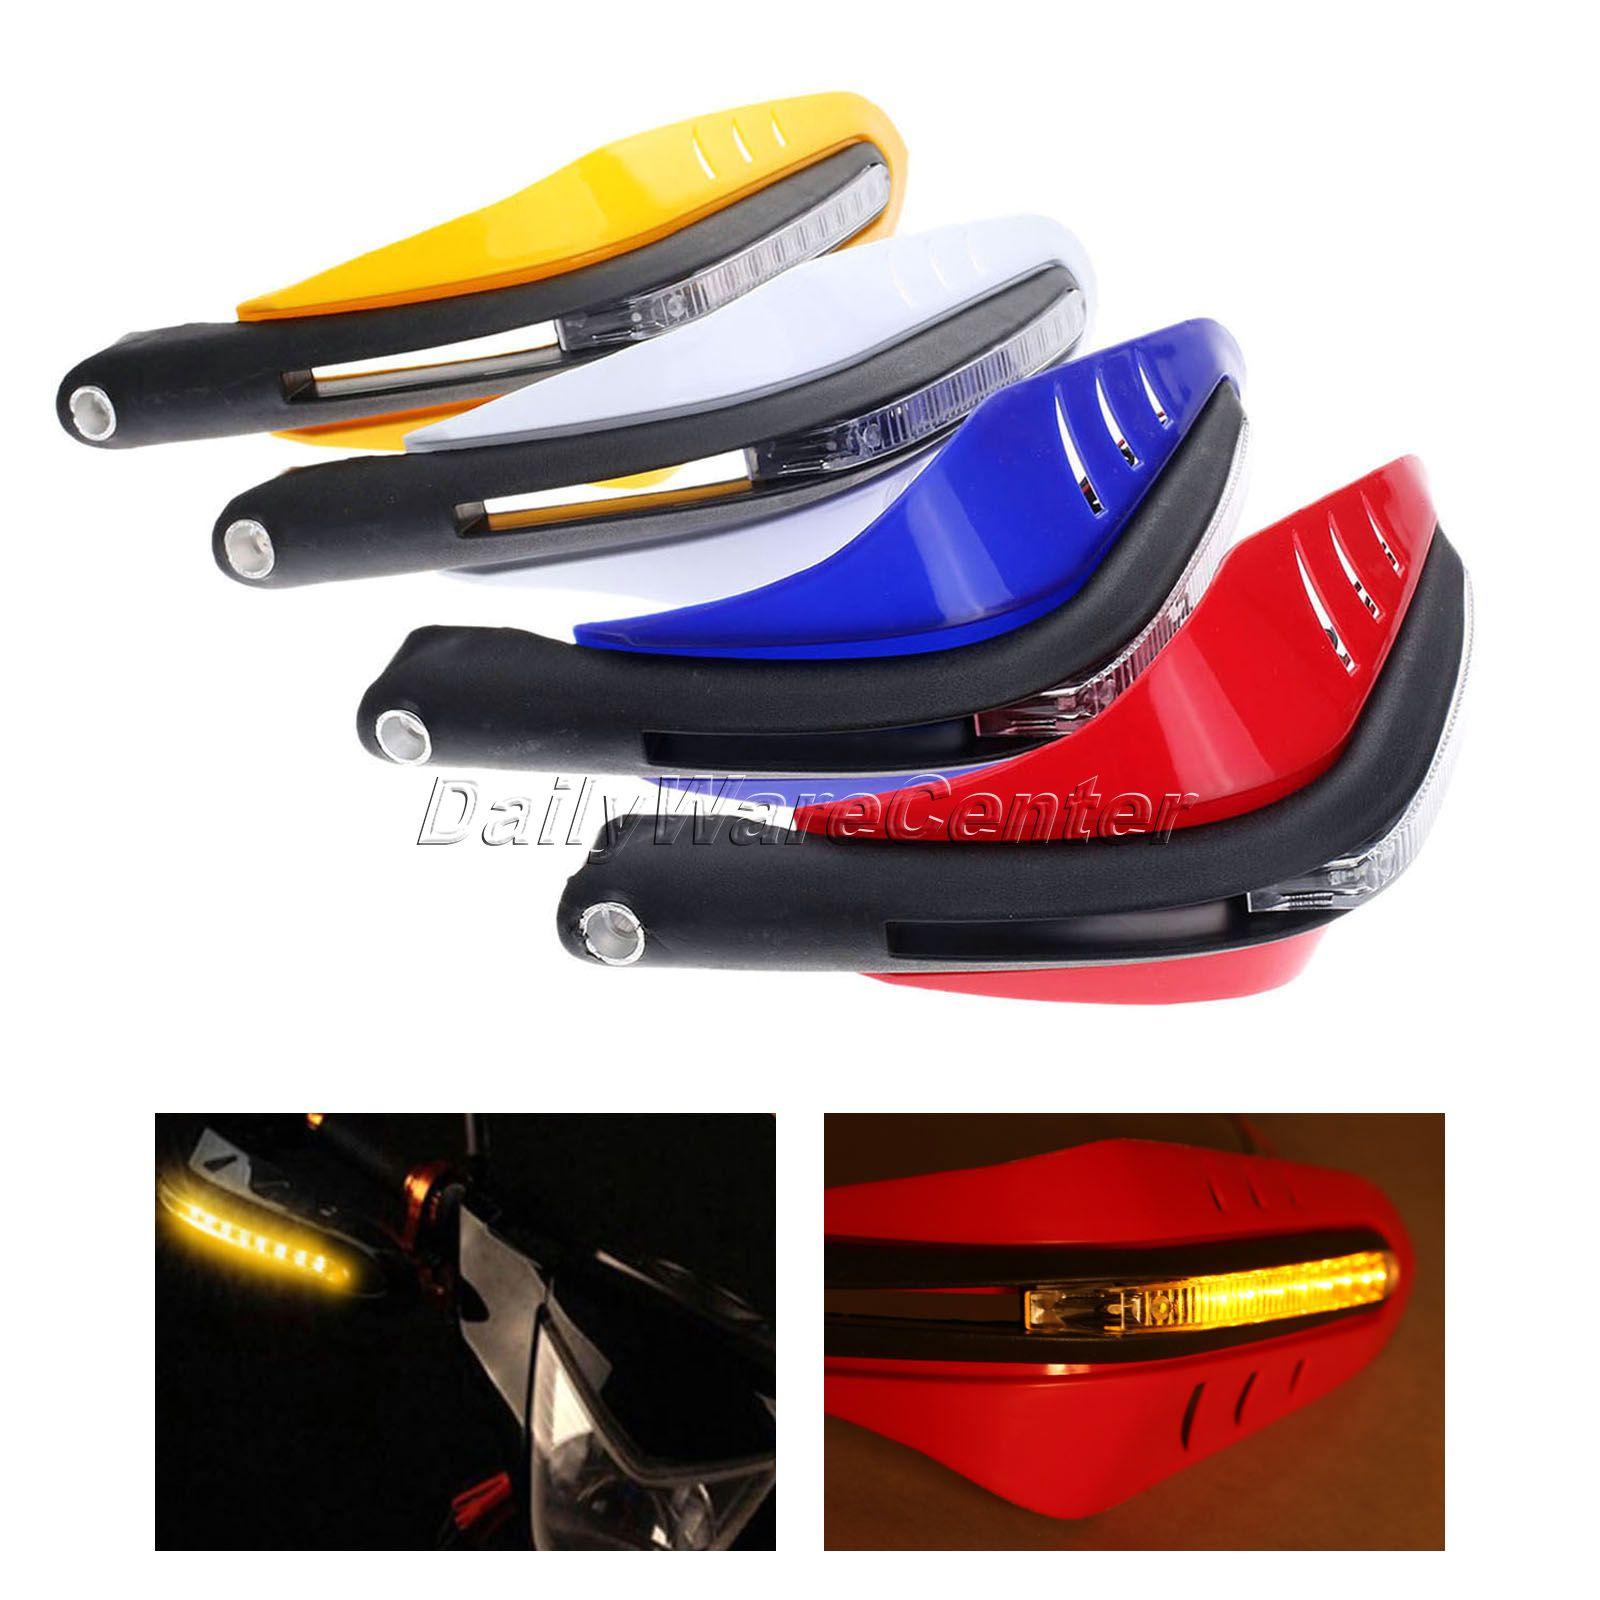 "7//8/"" Motorcycle LED Handguards Hand Guard For Yamaha FZS 1000 FAZER 2000-2005"